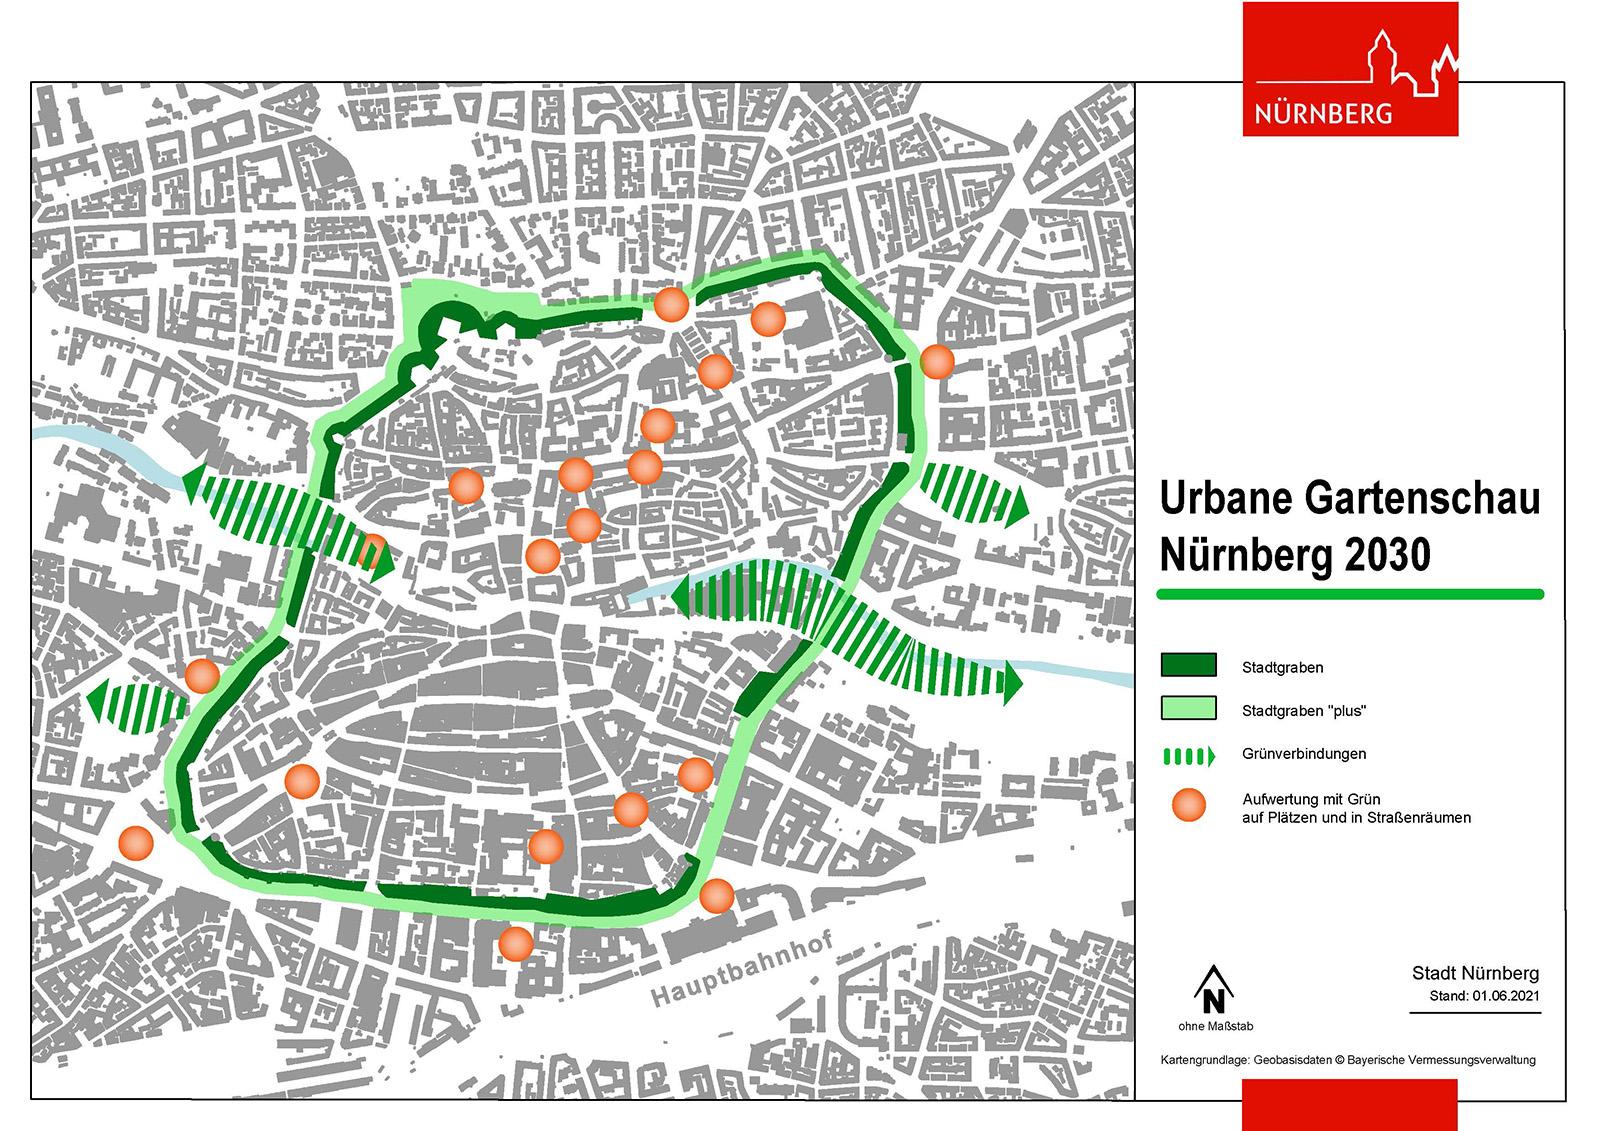 Urbane Gartenschau Nürnberg 2030